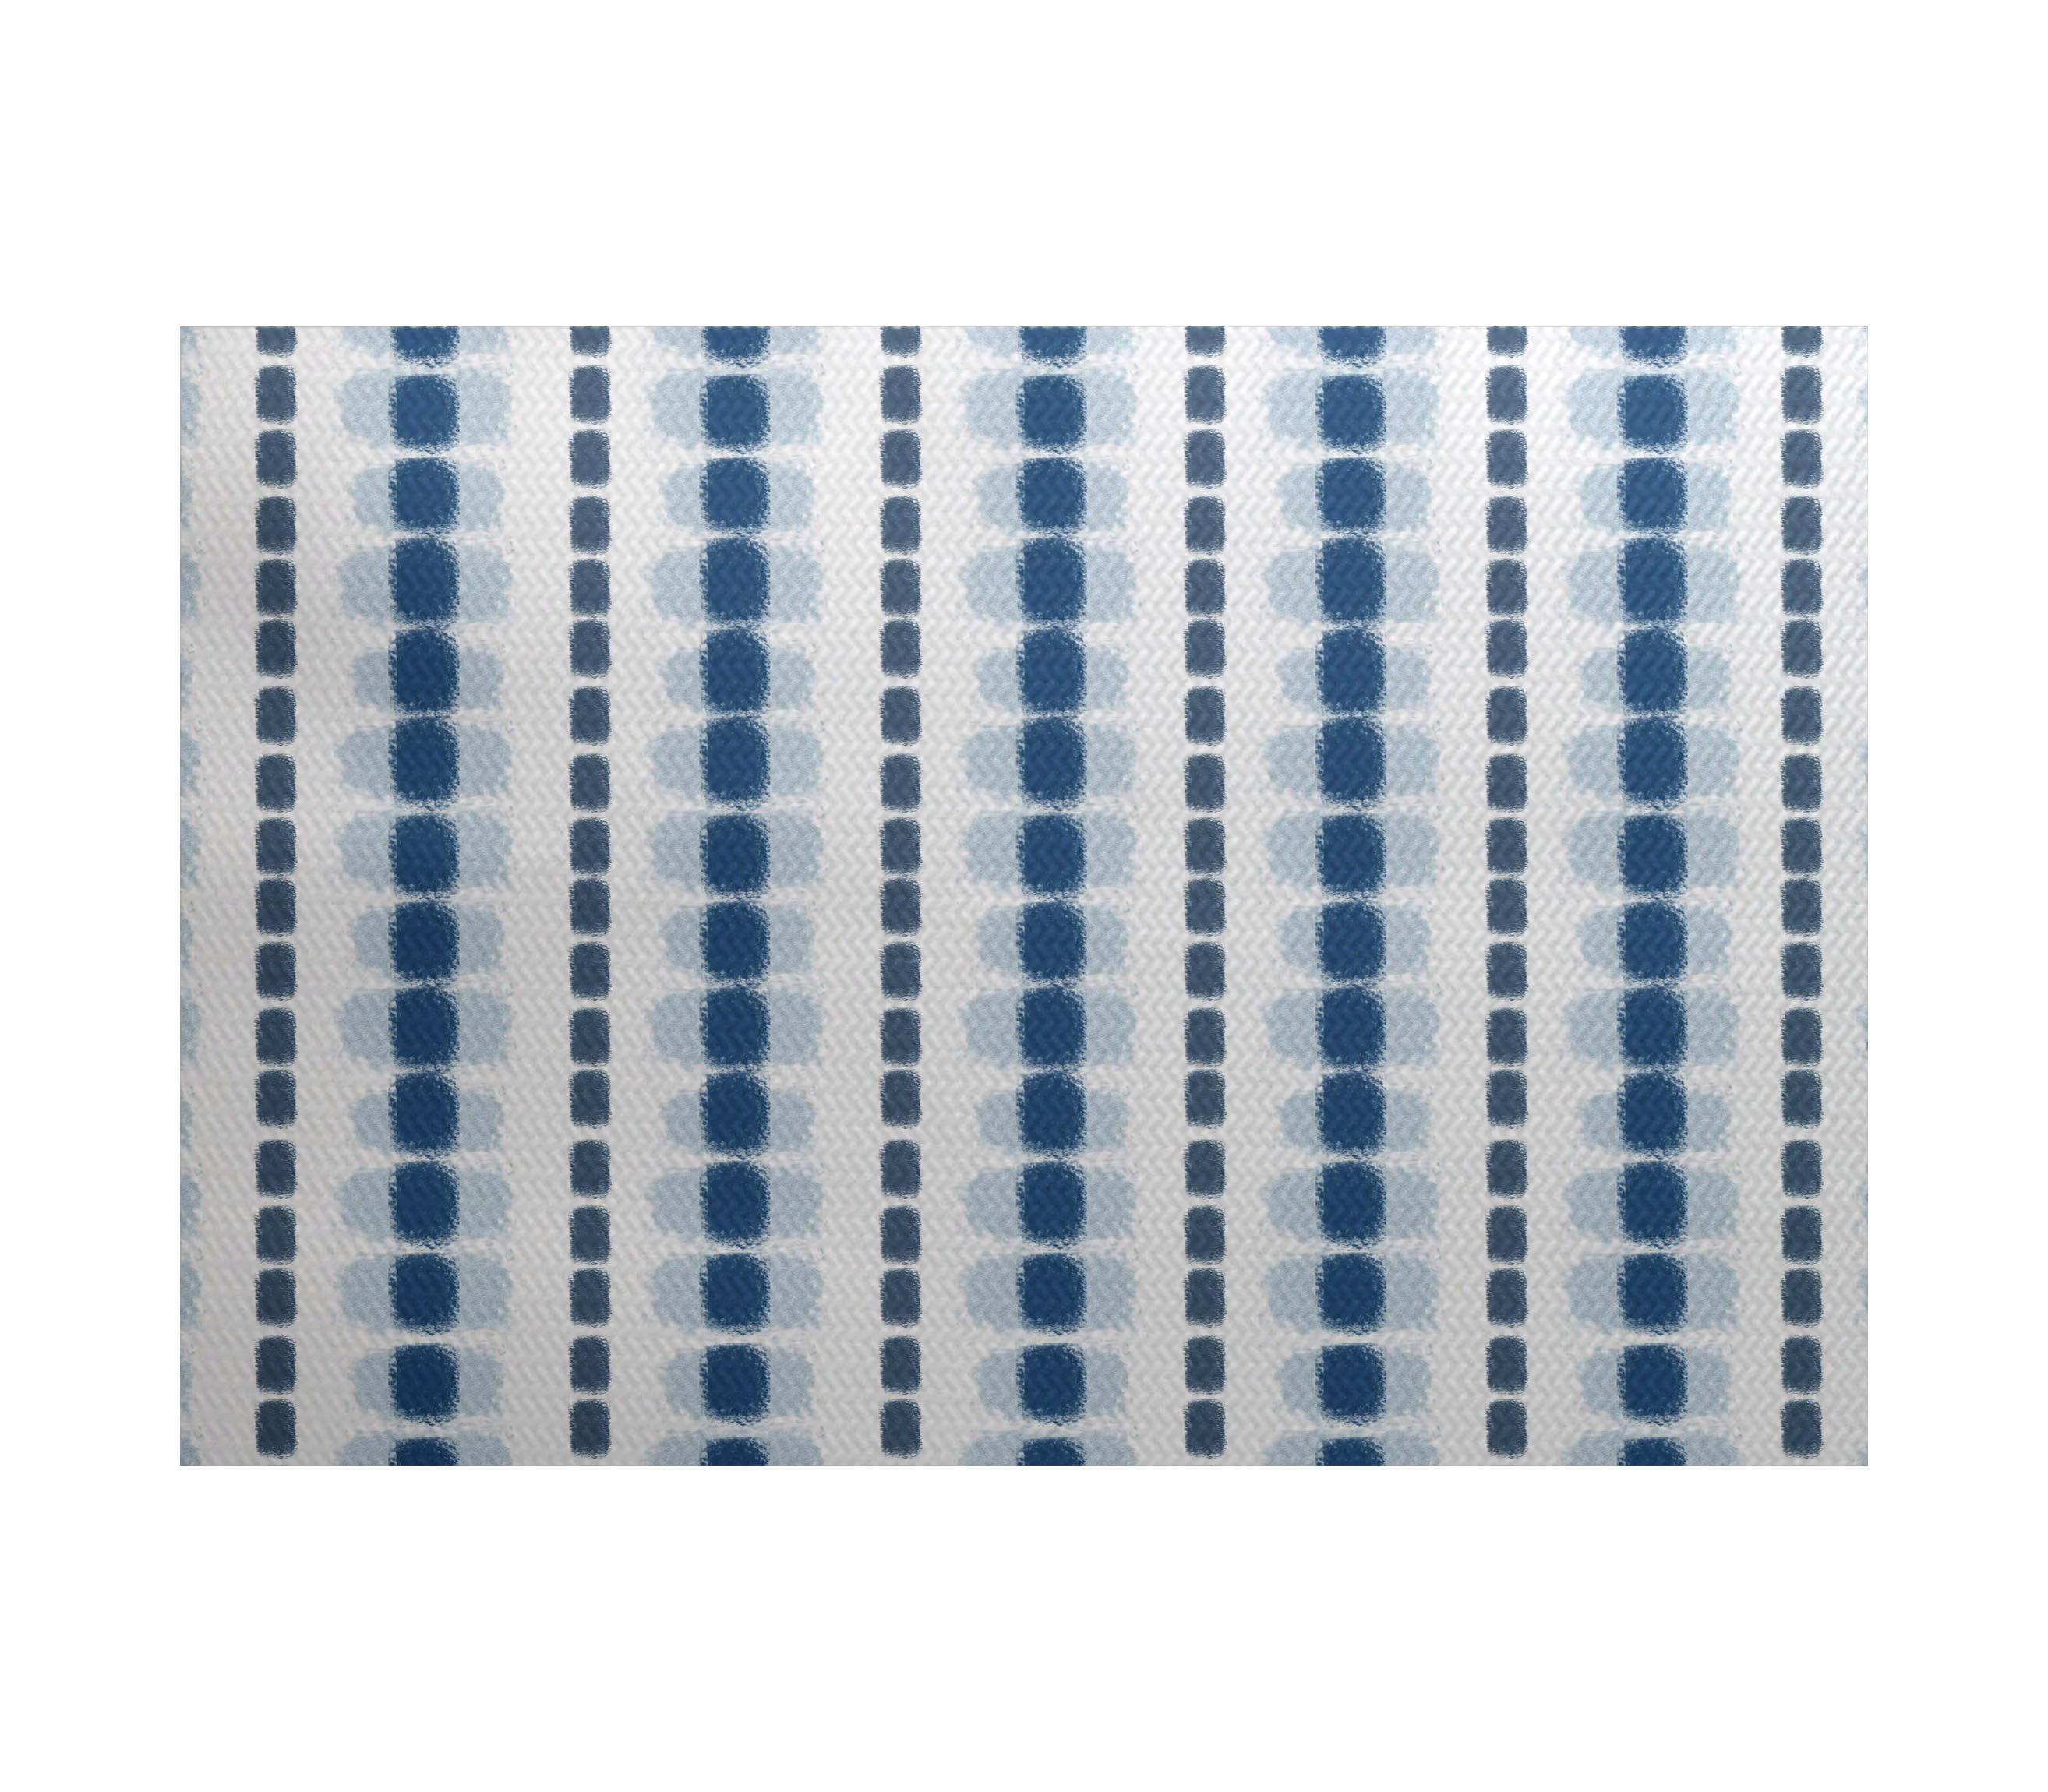 Bronx Blue Bedroom Project: Ivy Bronx Leal Flatweave Blue/White Area Rug